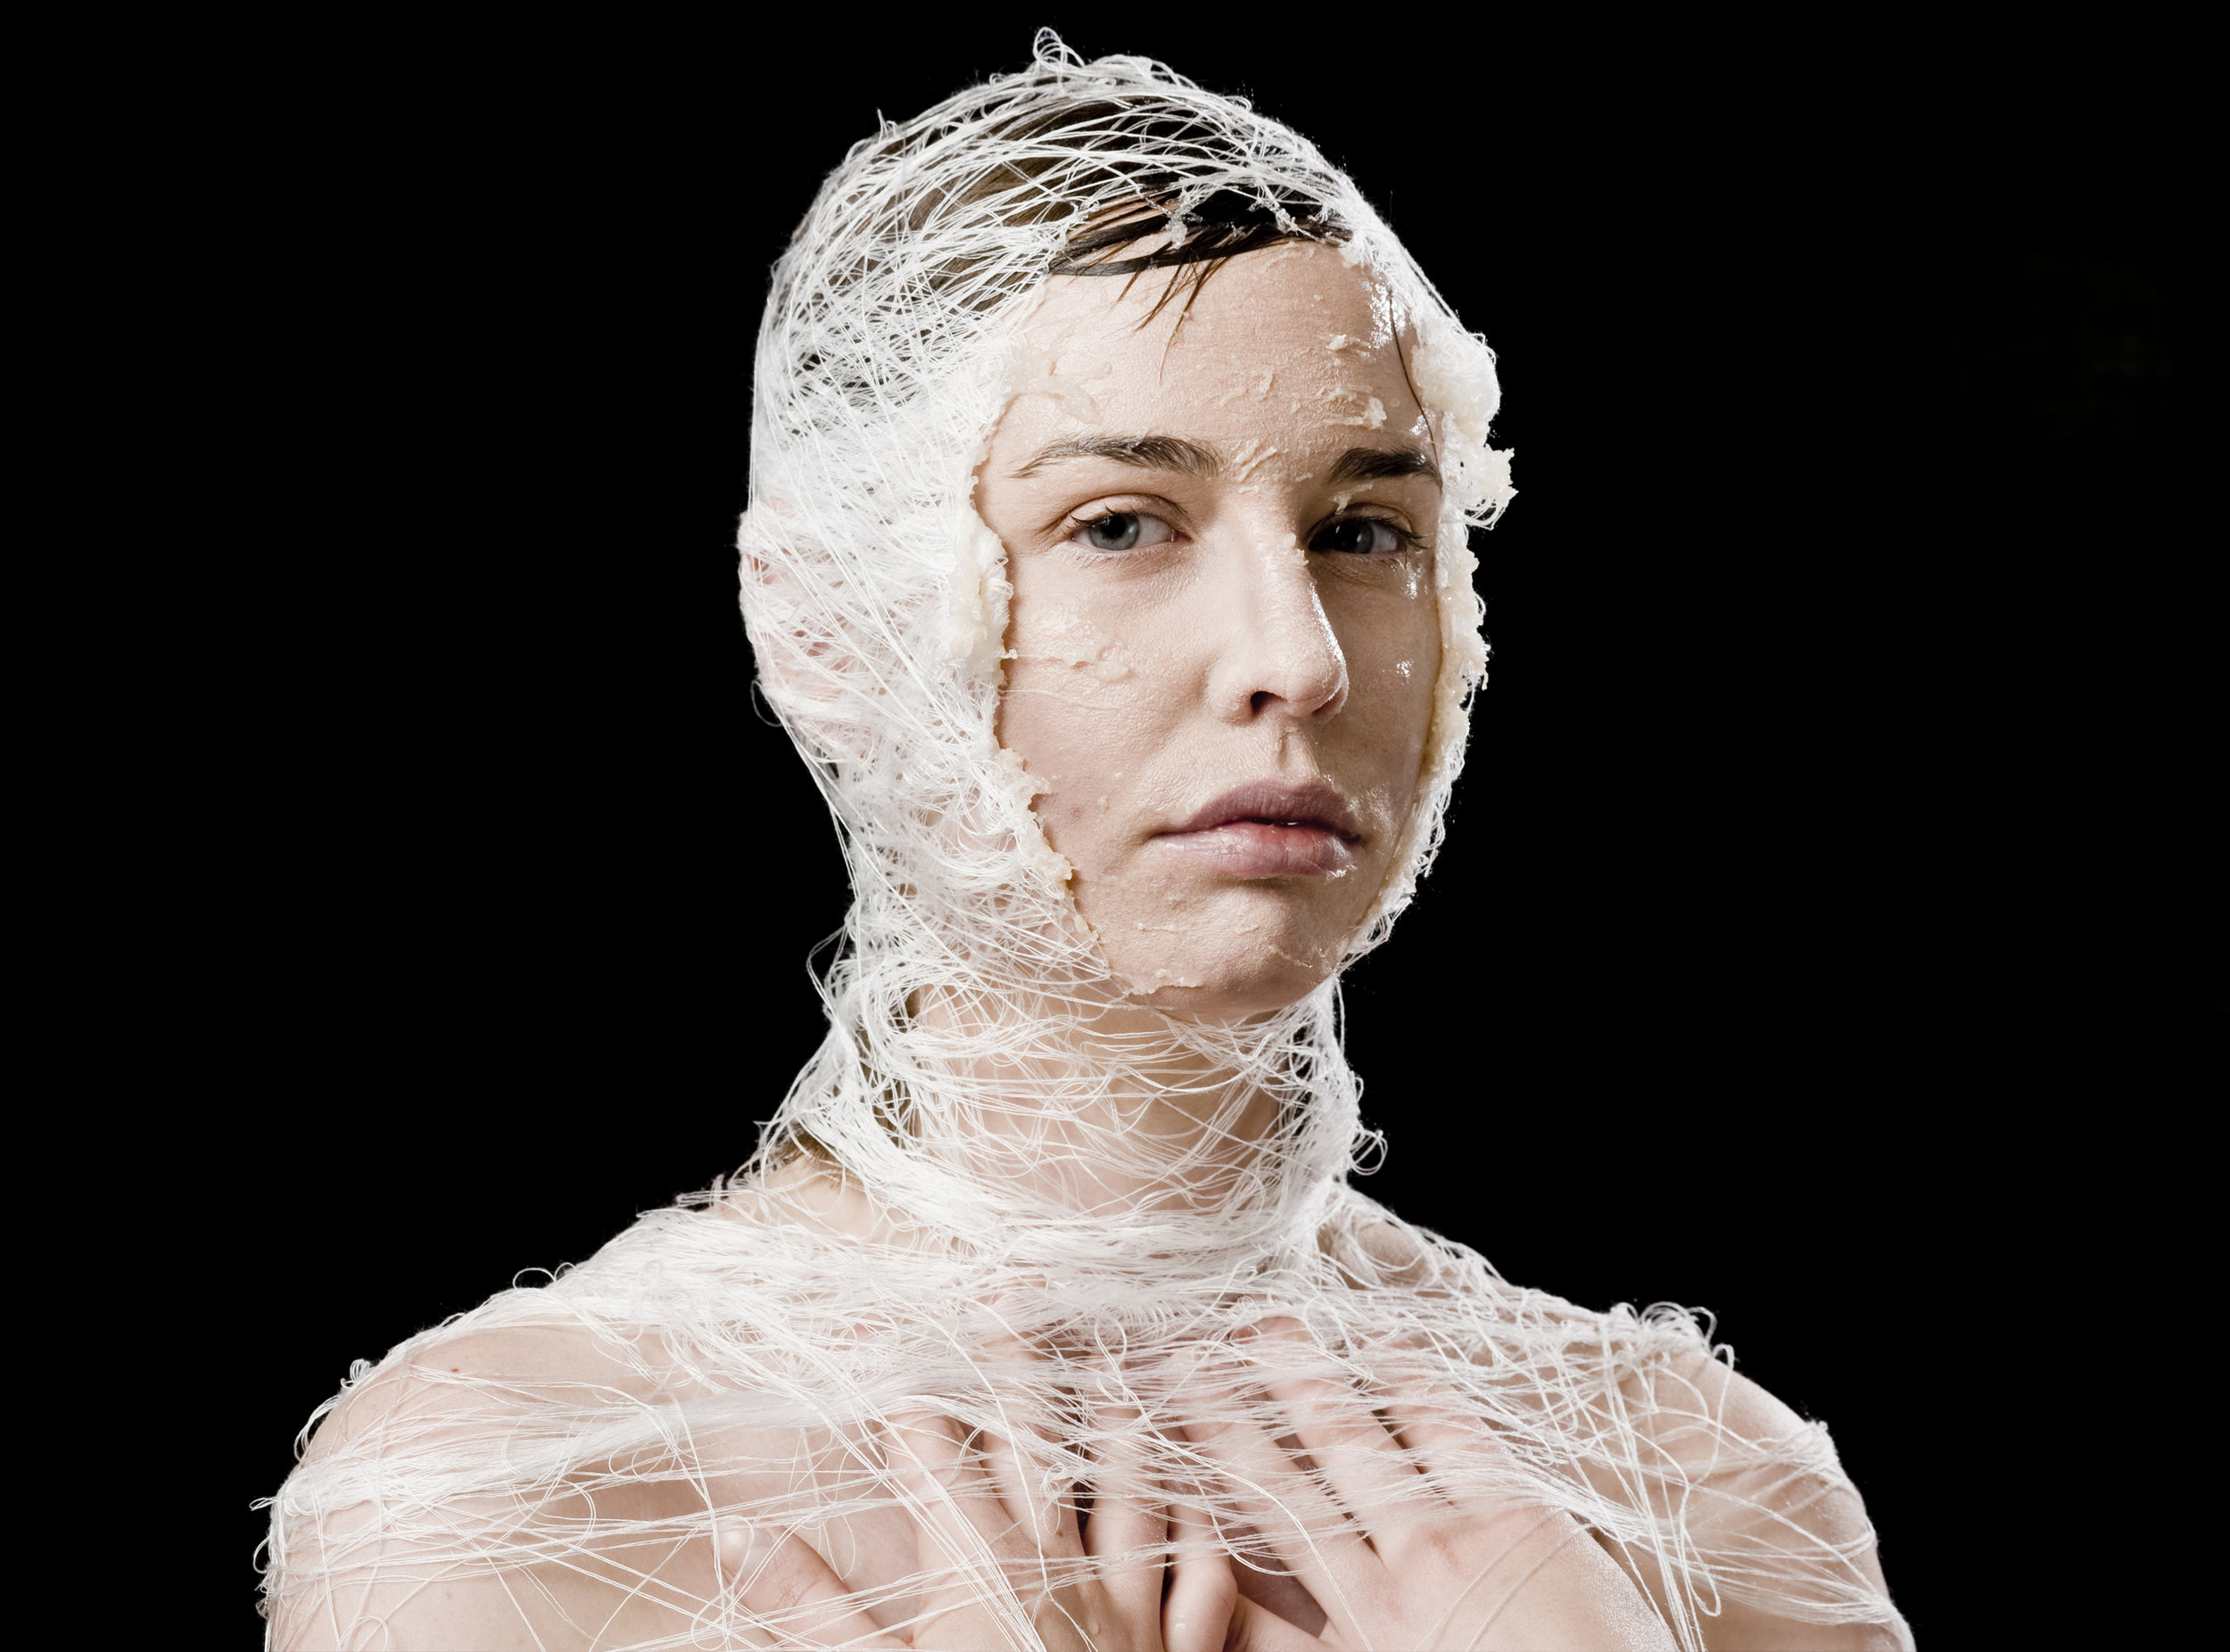 The Body Dissolves 'Garment For The Grave' by Pia Interlandi Image by Devika Bilimoria